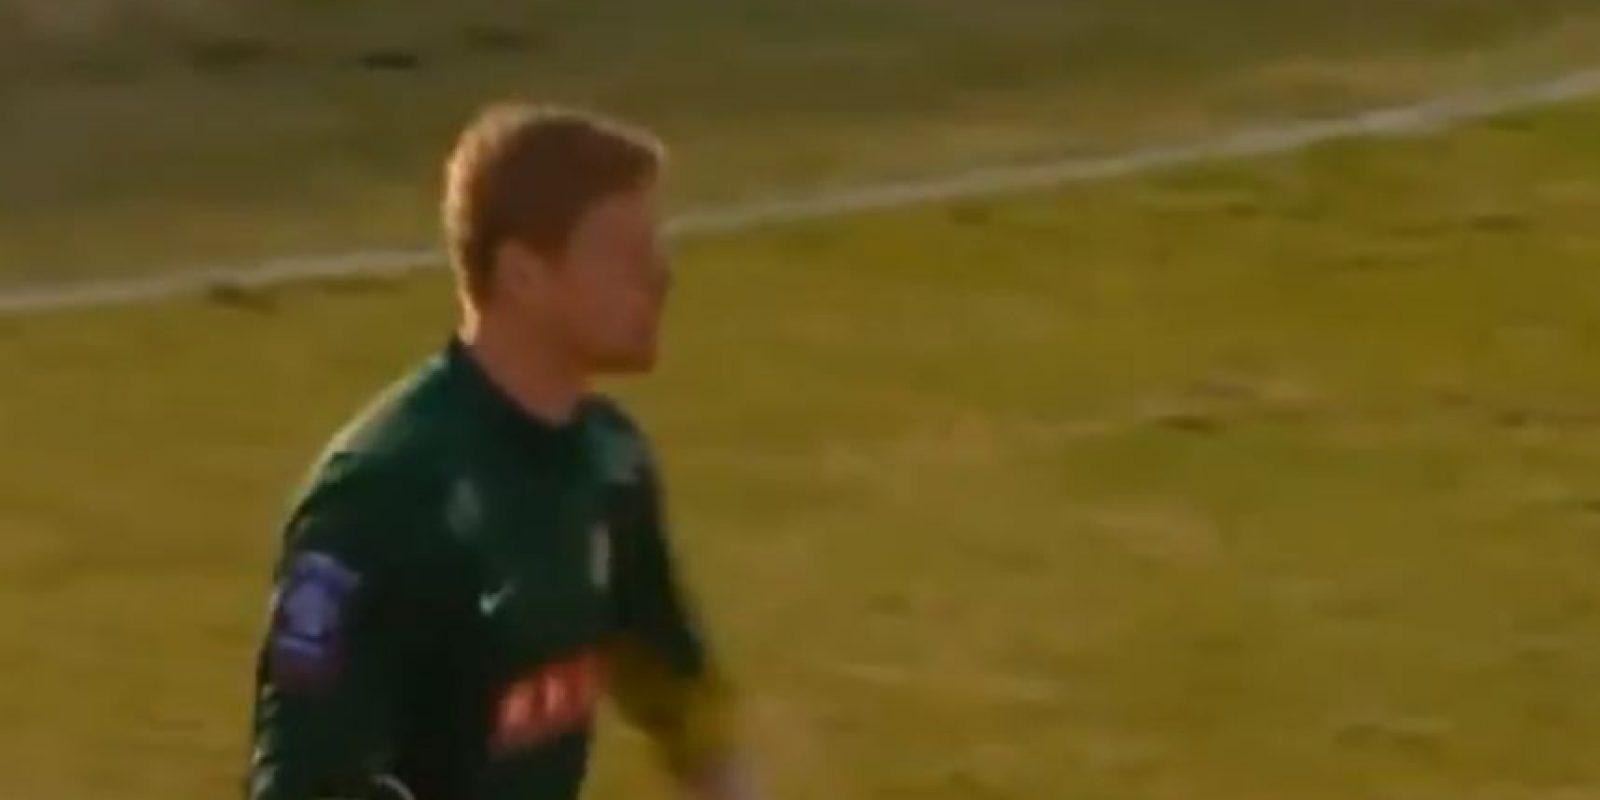 Patrik Christoffer Kallqvist Foto:Youtube: futboletetv